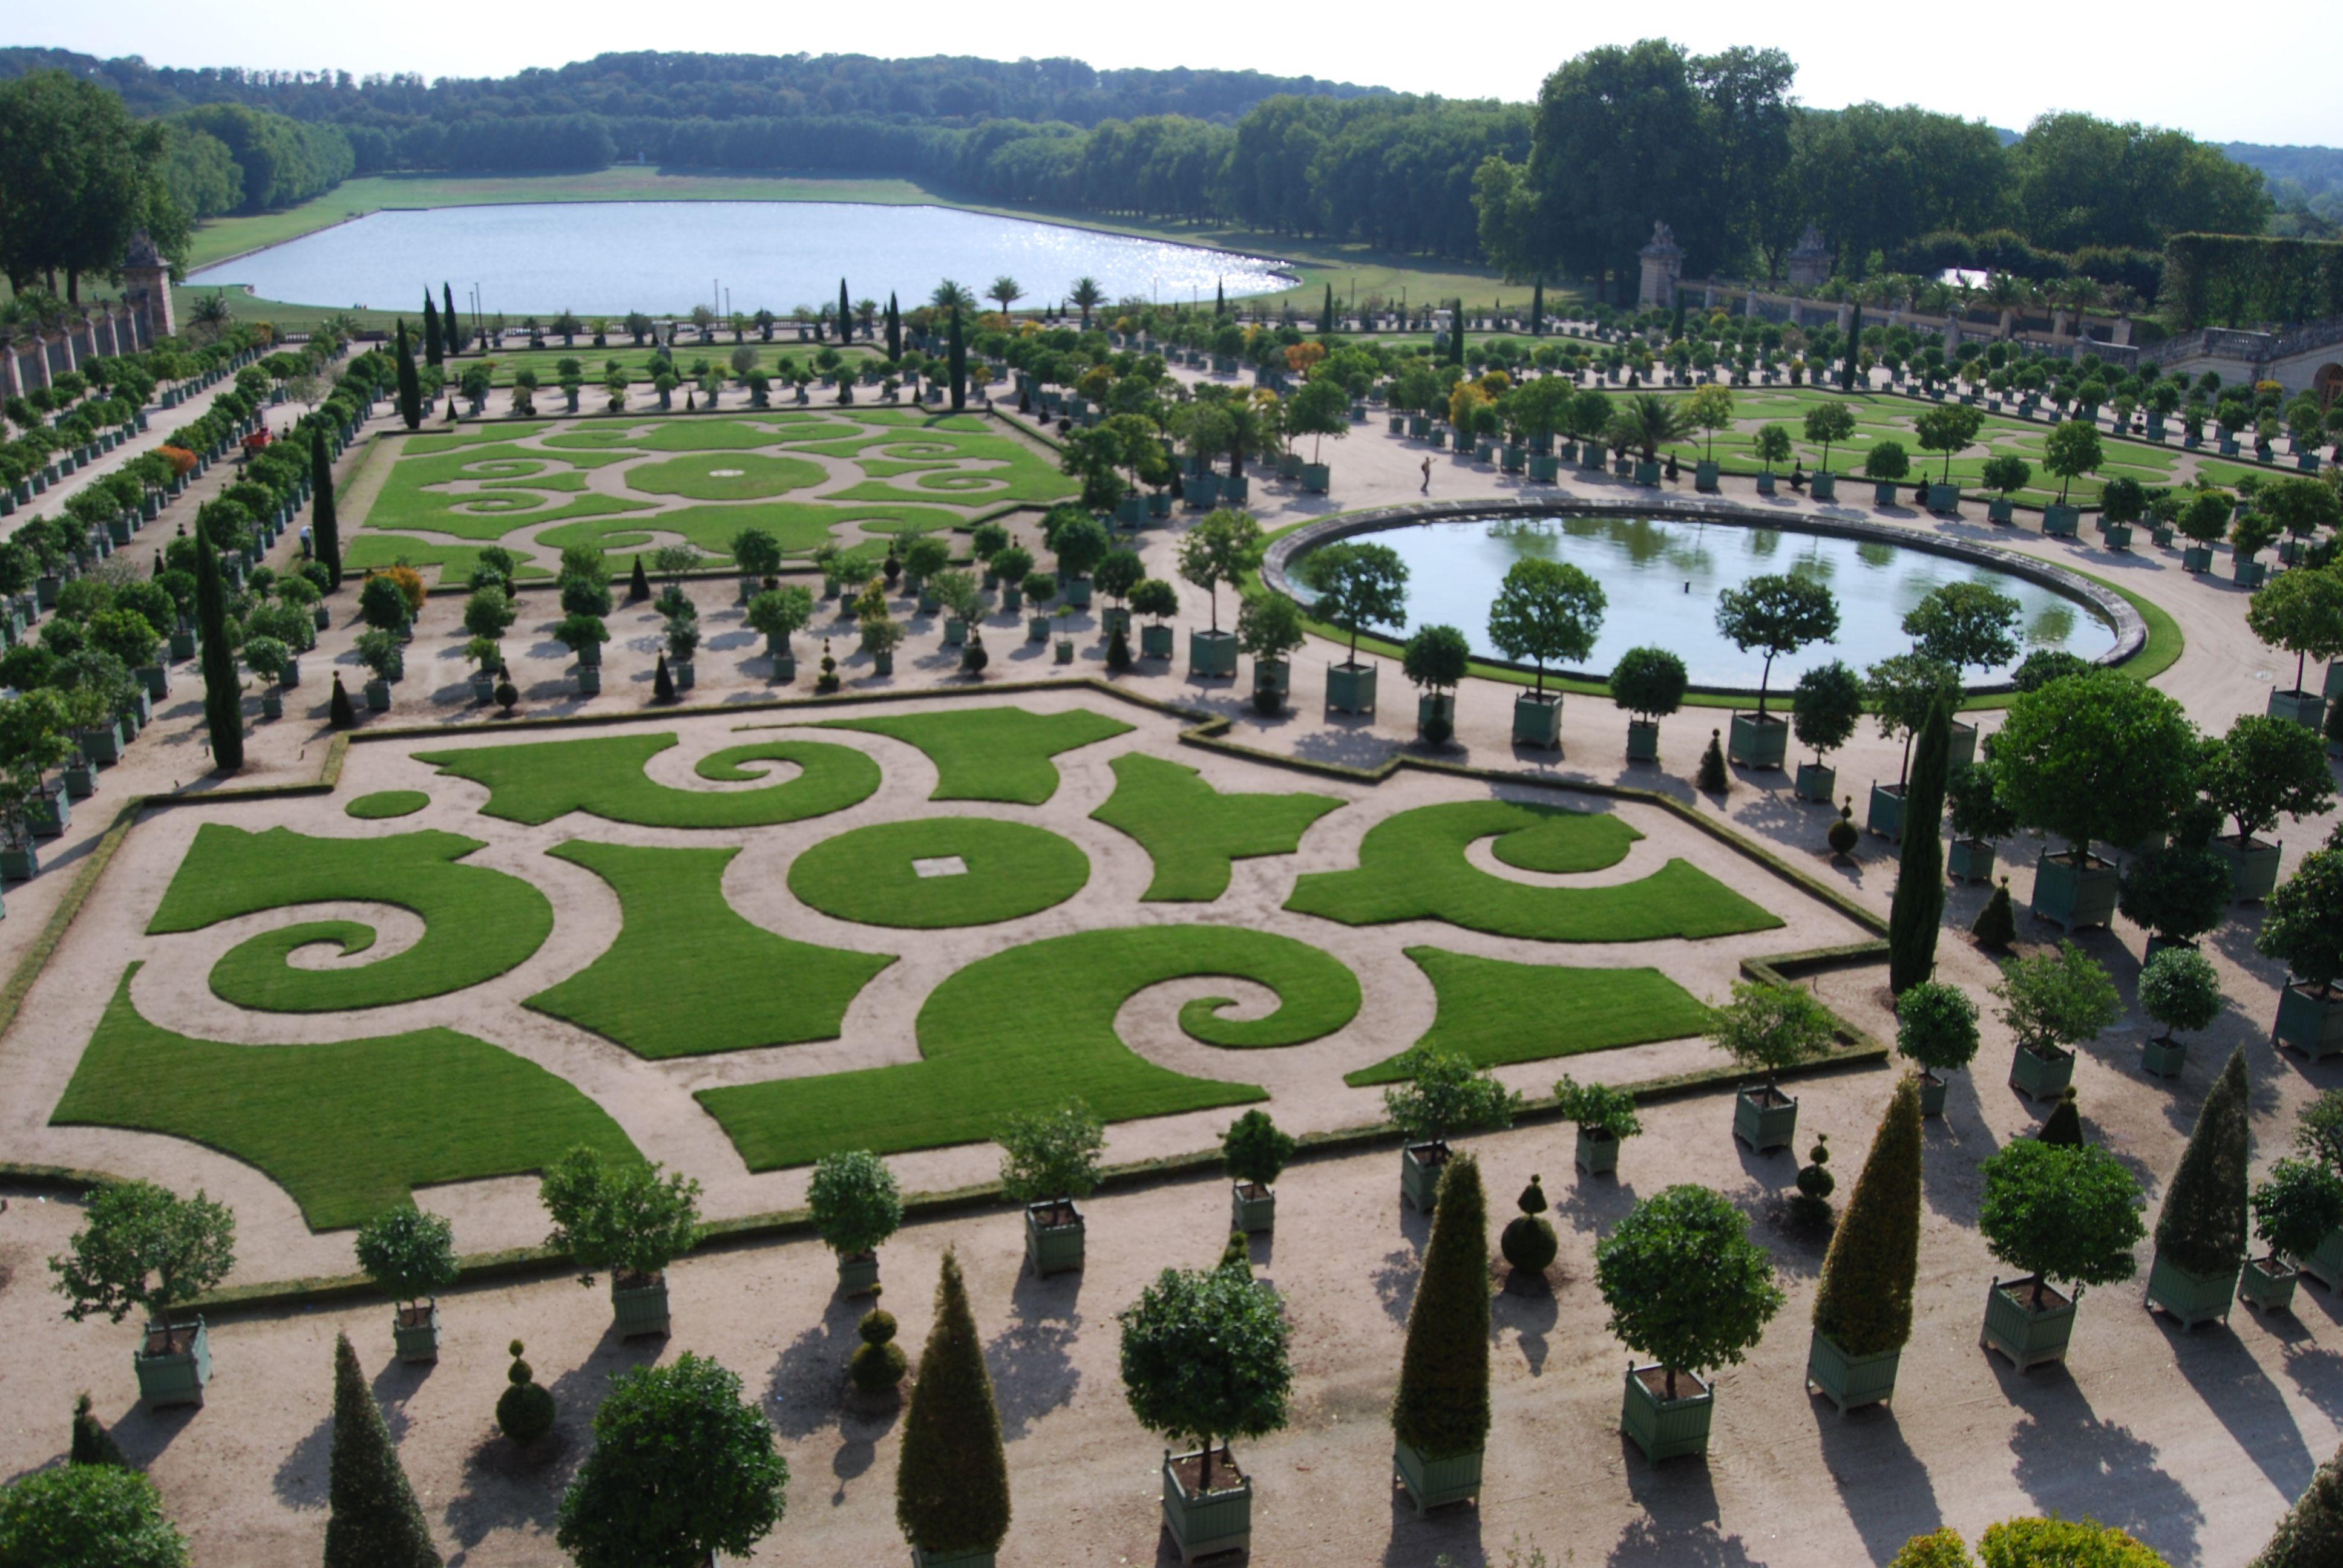 6d719d112bbe1821a9bbc0292e83703d - Who Designed The Gardens Of Versailles